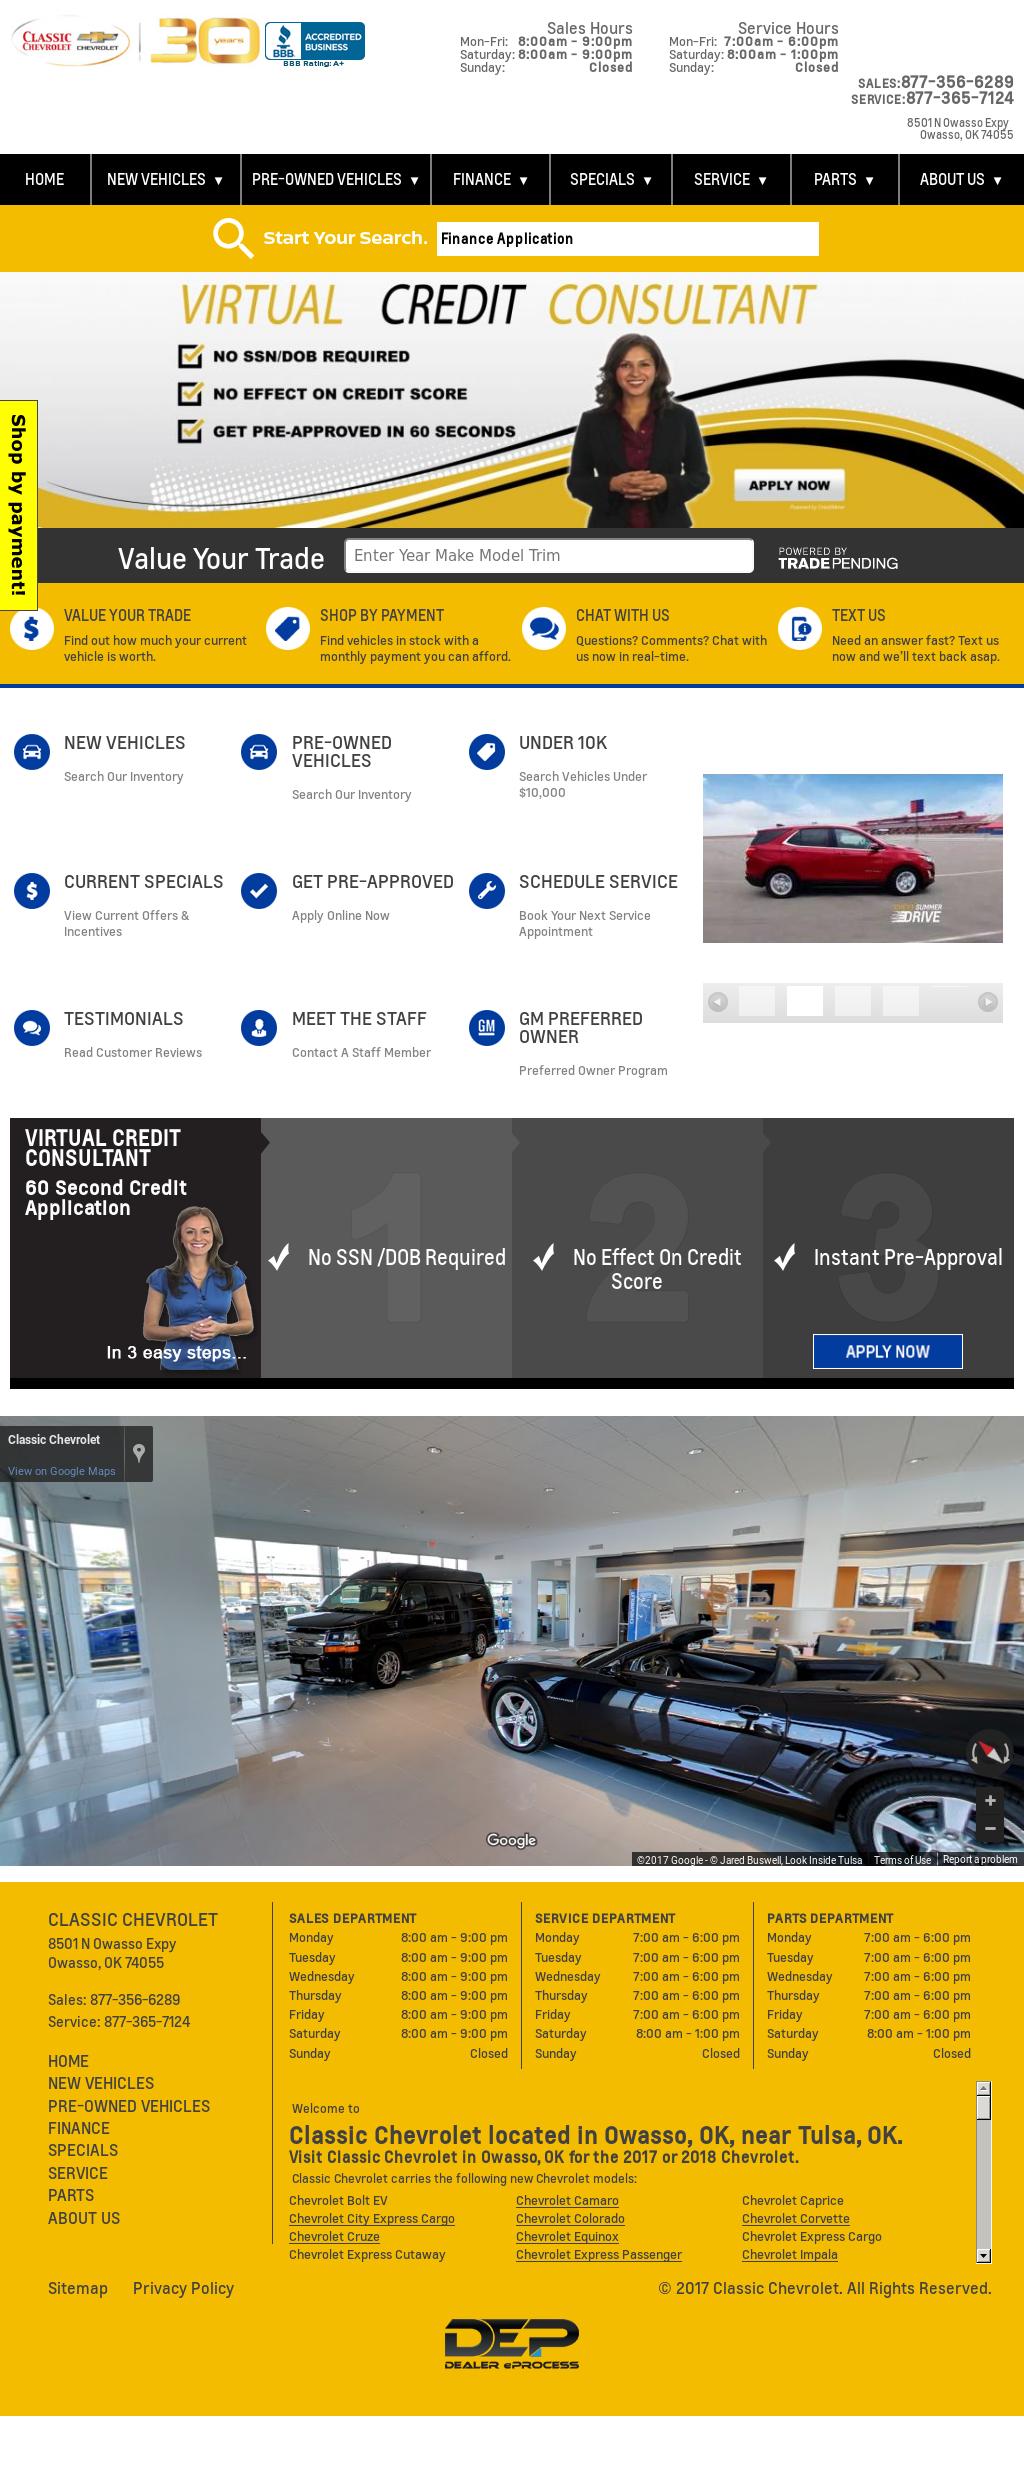 Classic Chevrolet Commercial Fleet Division Competitors